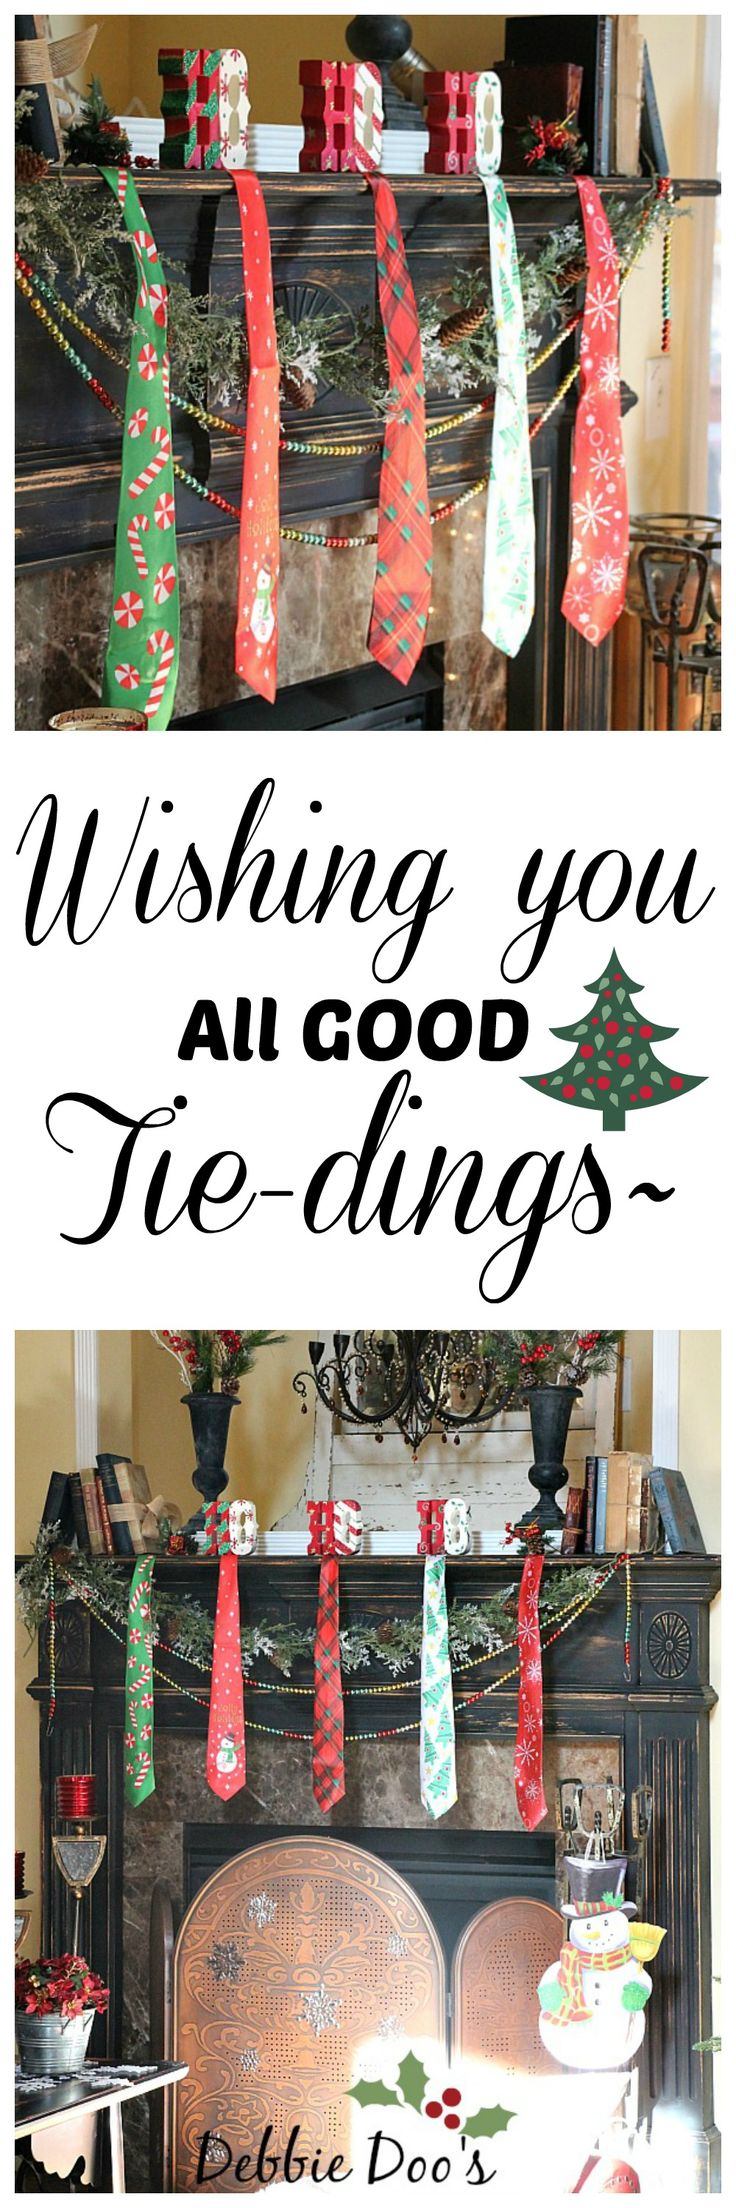 Christmas mantel ideas. Wishing you all good TIE-dings~#debbiedoos. Dollar tree decor